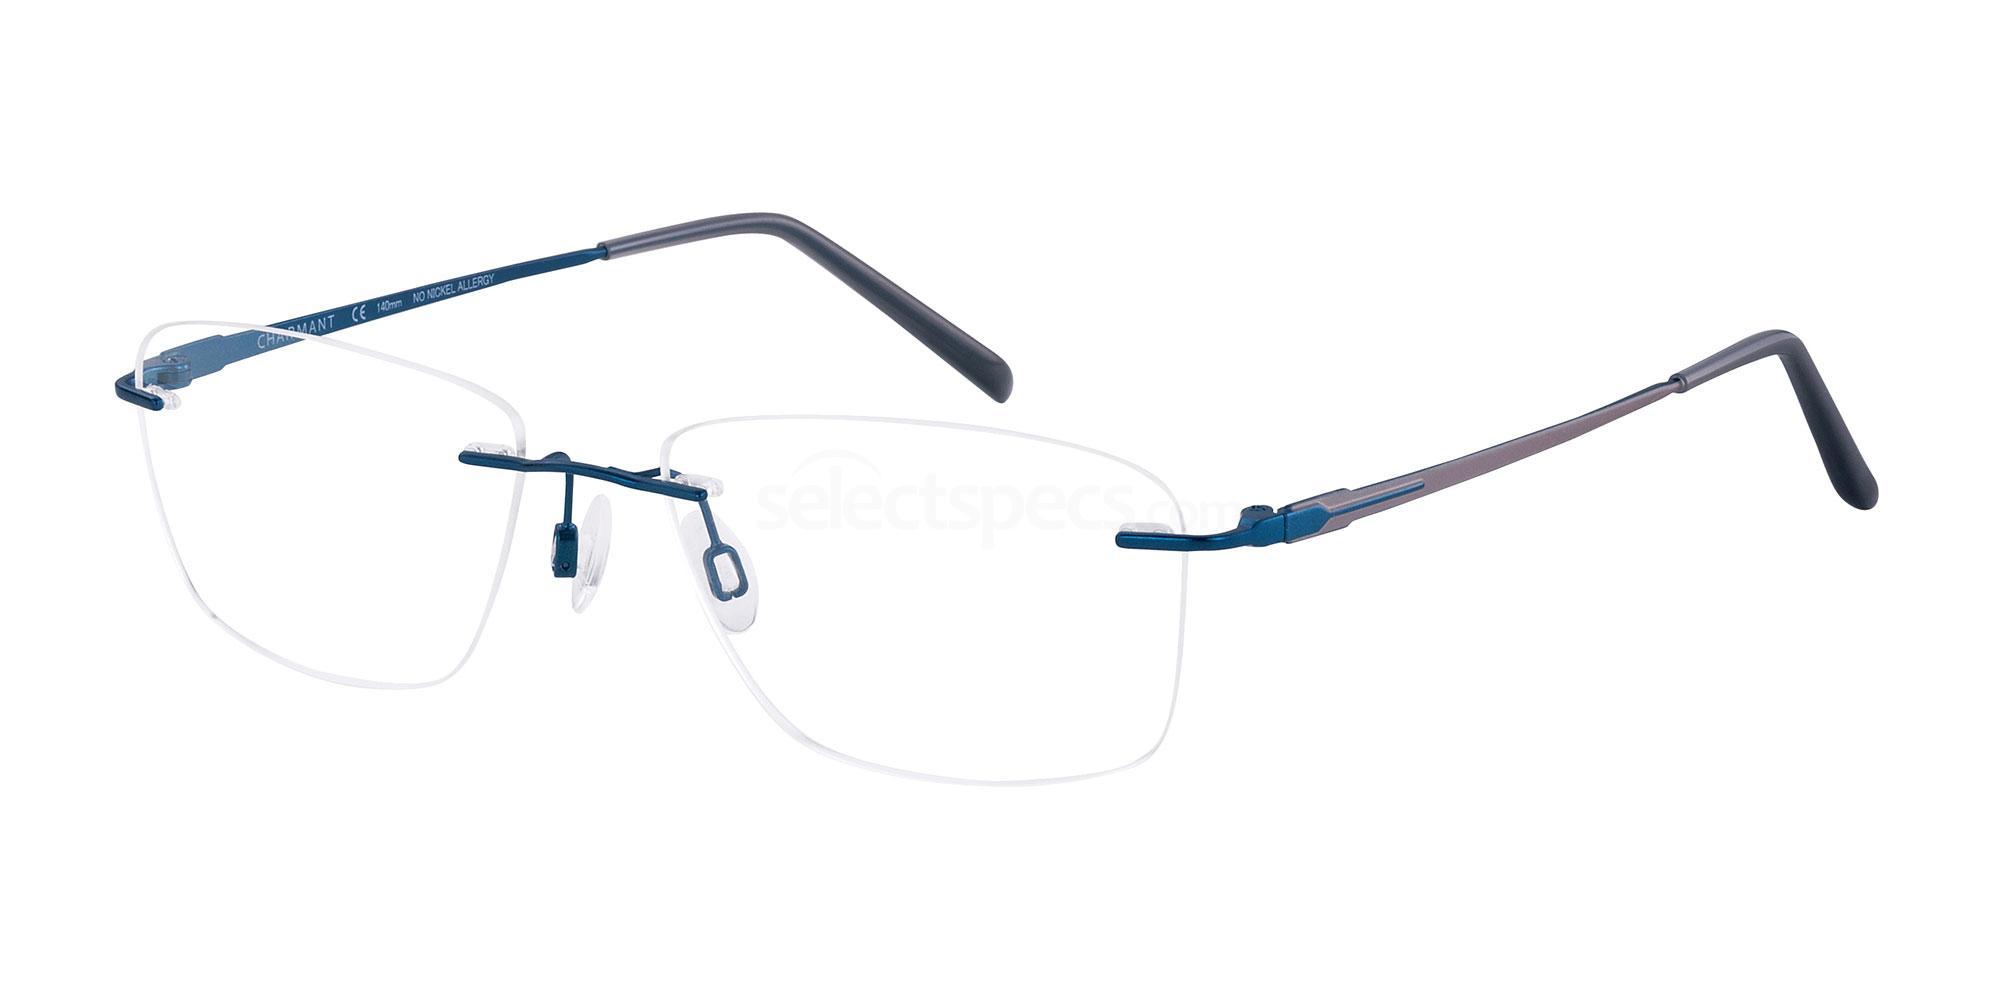 BL CH10976 Glasses, Charmant Titanium Perfection